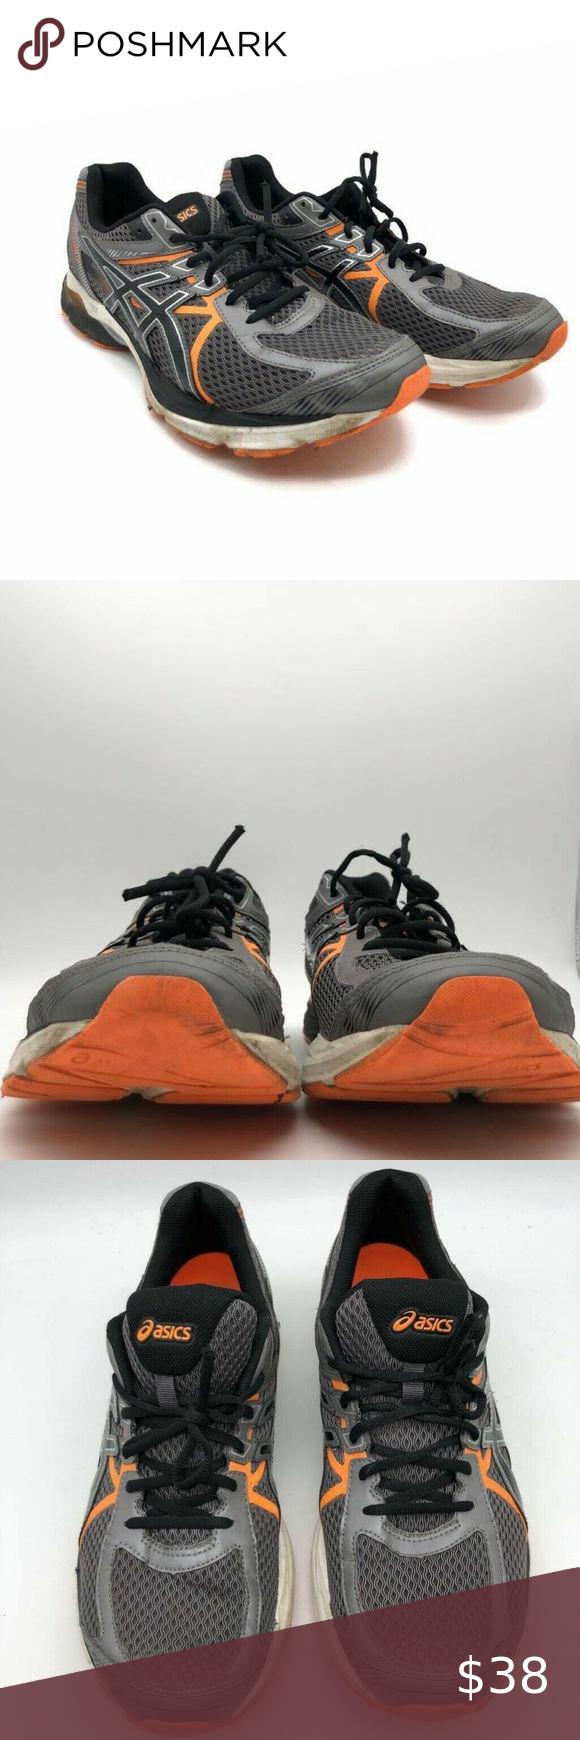 ASICS Mens Gel Flux 3 Running Shoes